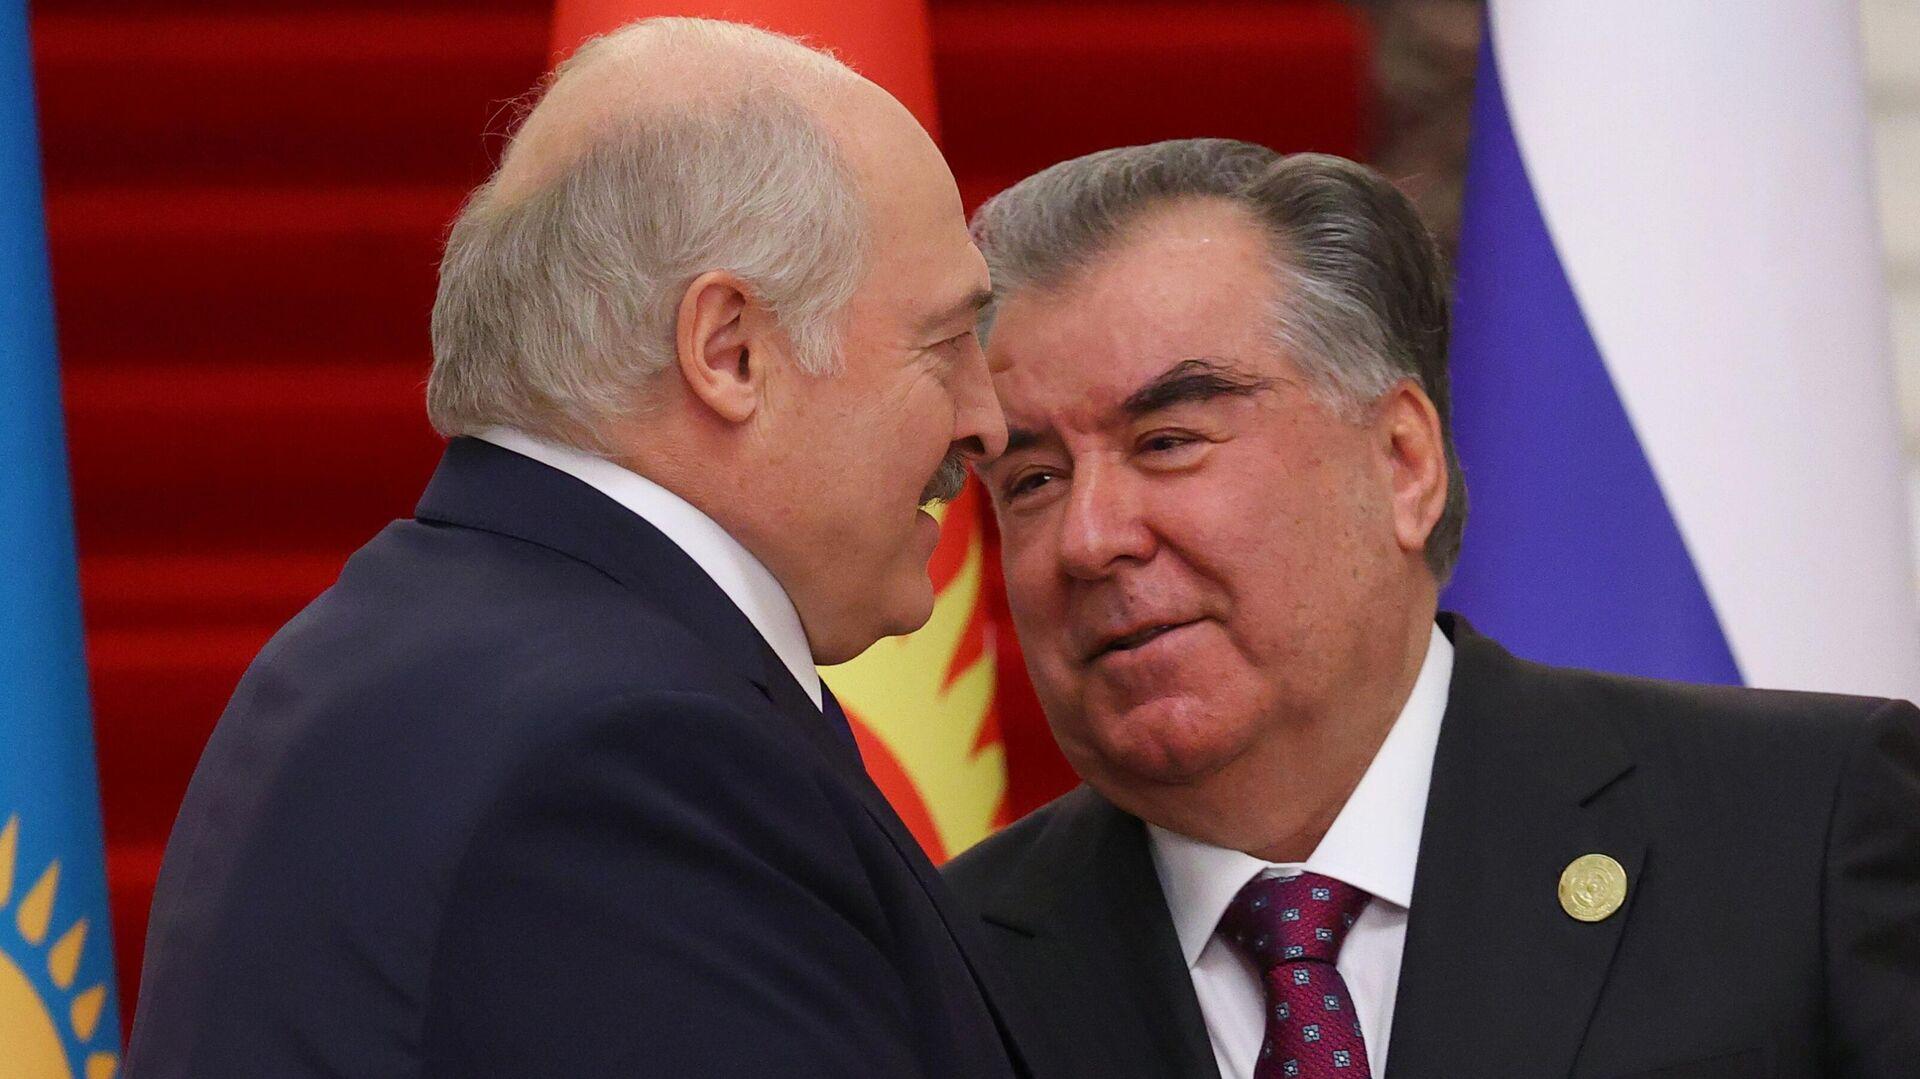 Президент Белоруссии Александр Лукашенко и президент Таджикистана Эмомали Рахмон  - Sputnik Тоҷикистон, 1920, 21.09.2021